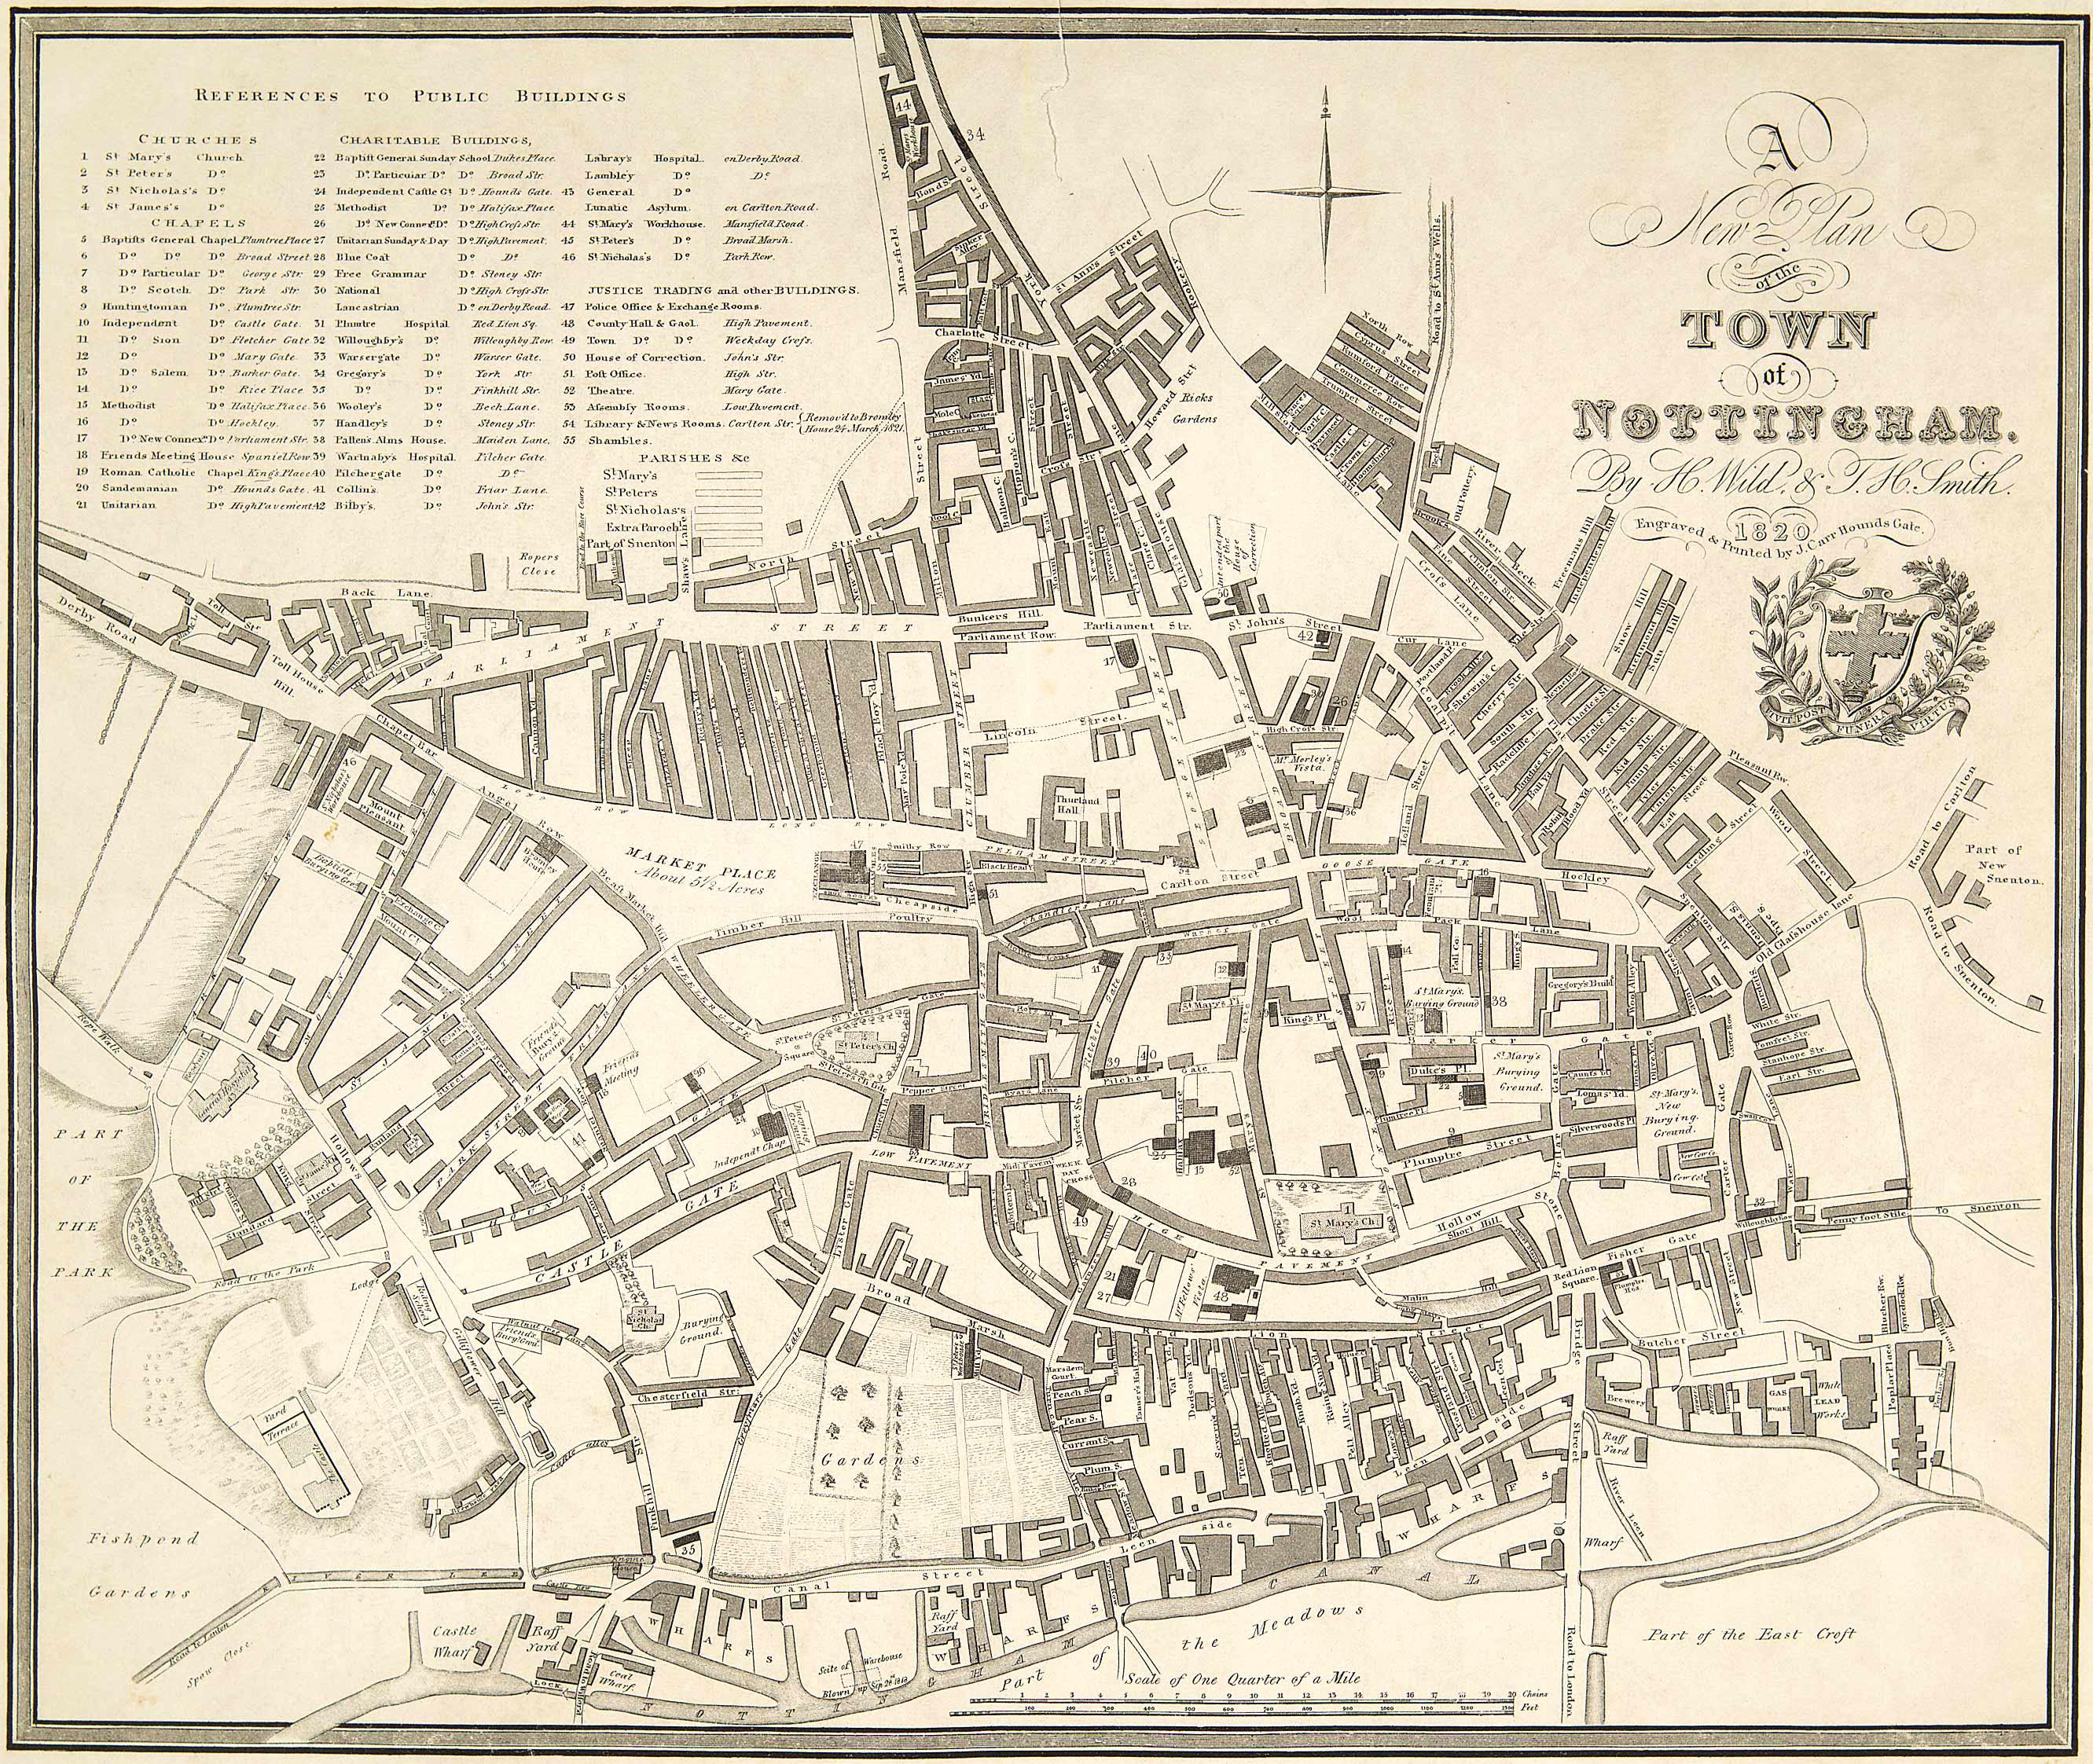 Maps The University of Nottingham